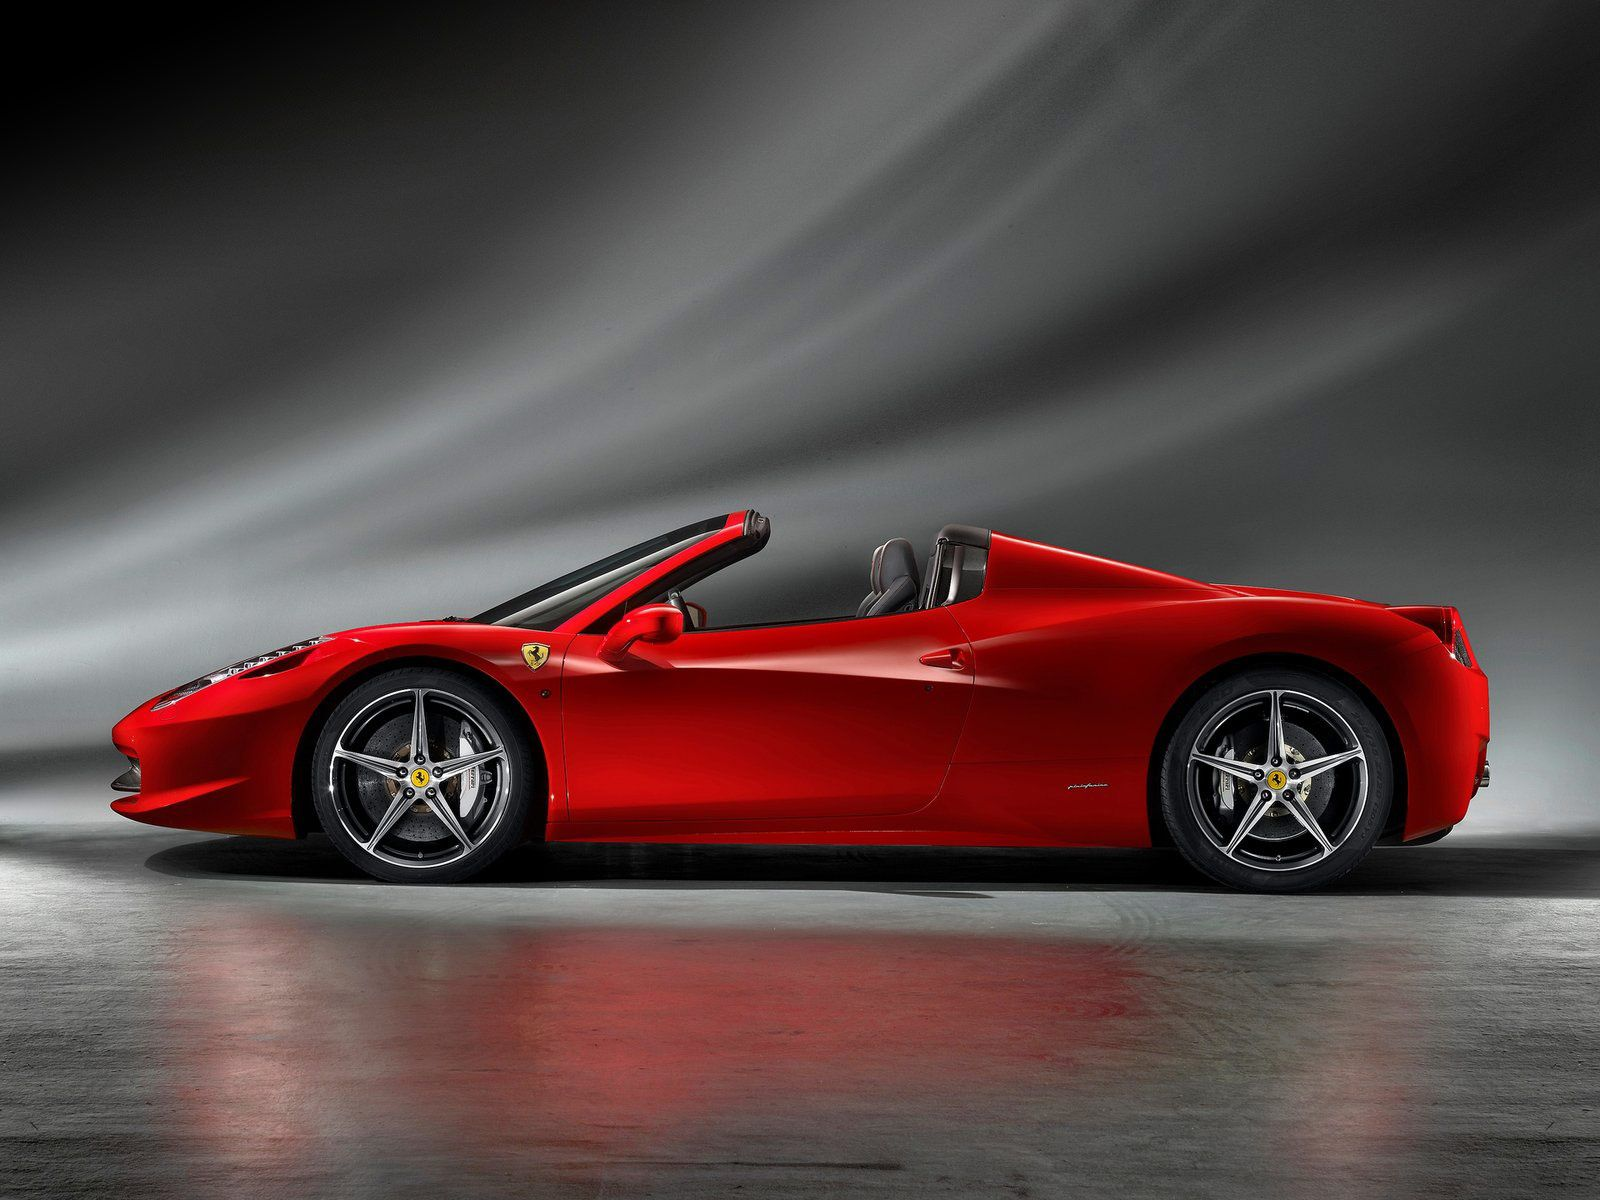 Foto Mobil Sport Kumpulan Foto Mobil Sport Dan Mobil Racing Ferrari 458 Italia Spider Ferrari 458 Ferrari 458 Italia